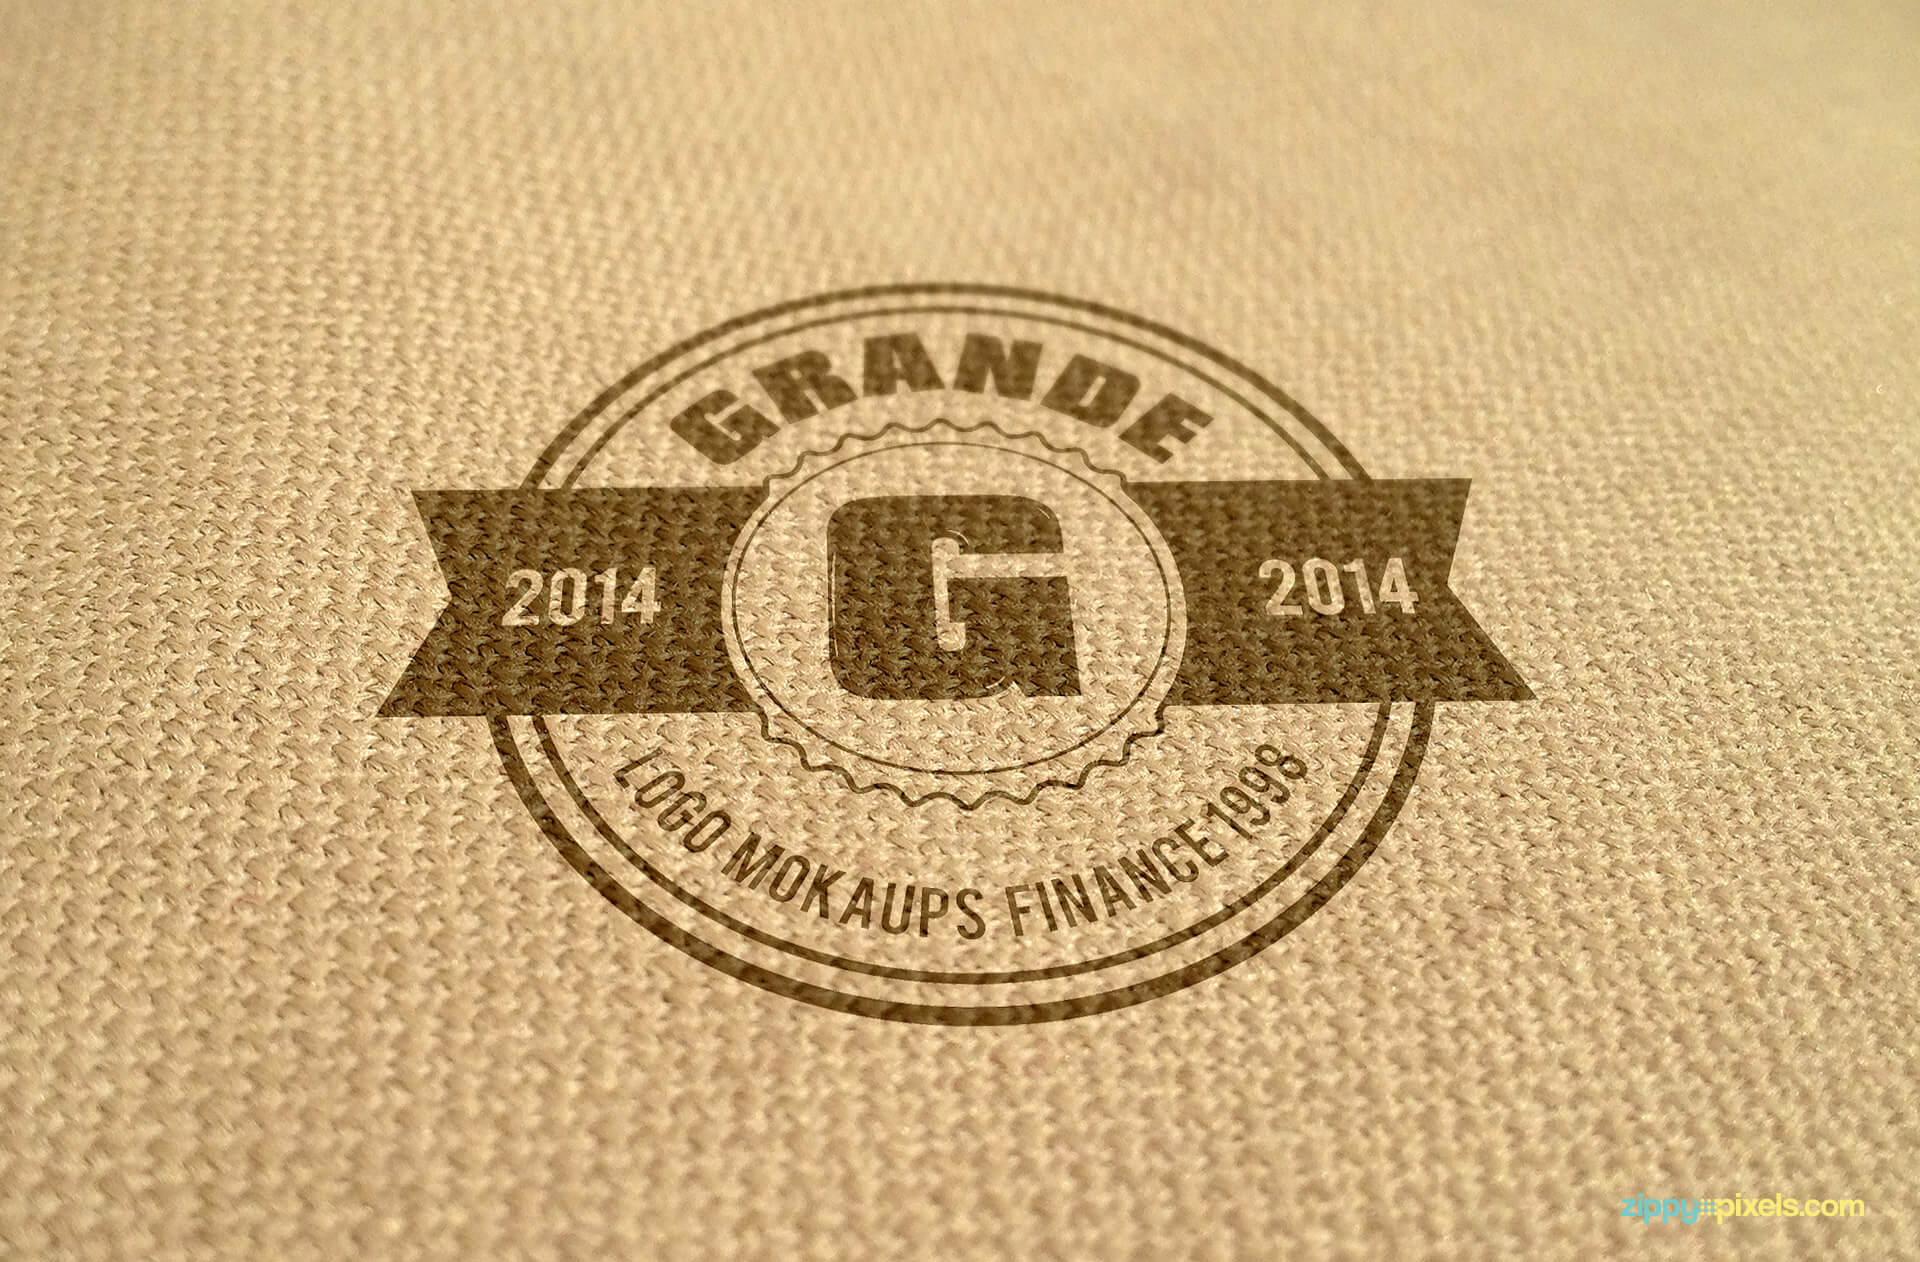 Mockup of logo printed on burlap fabric